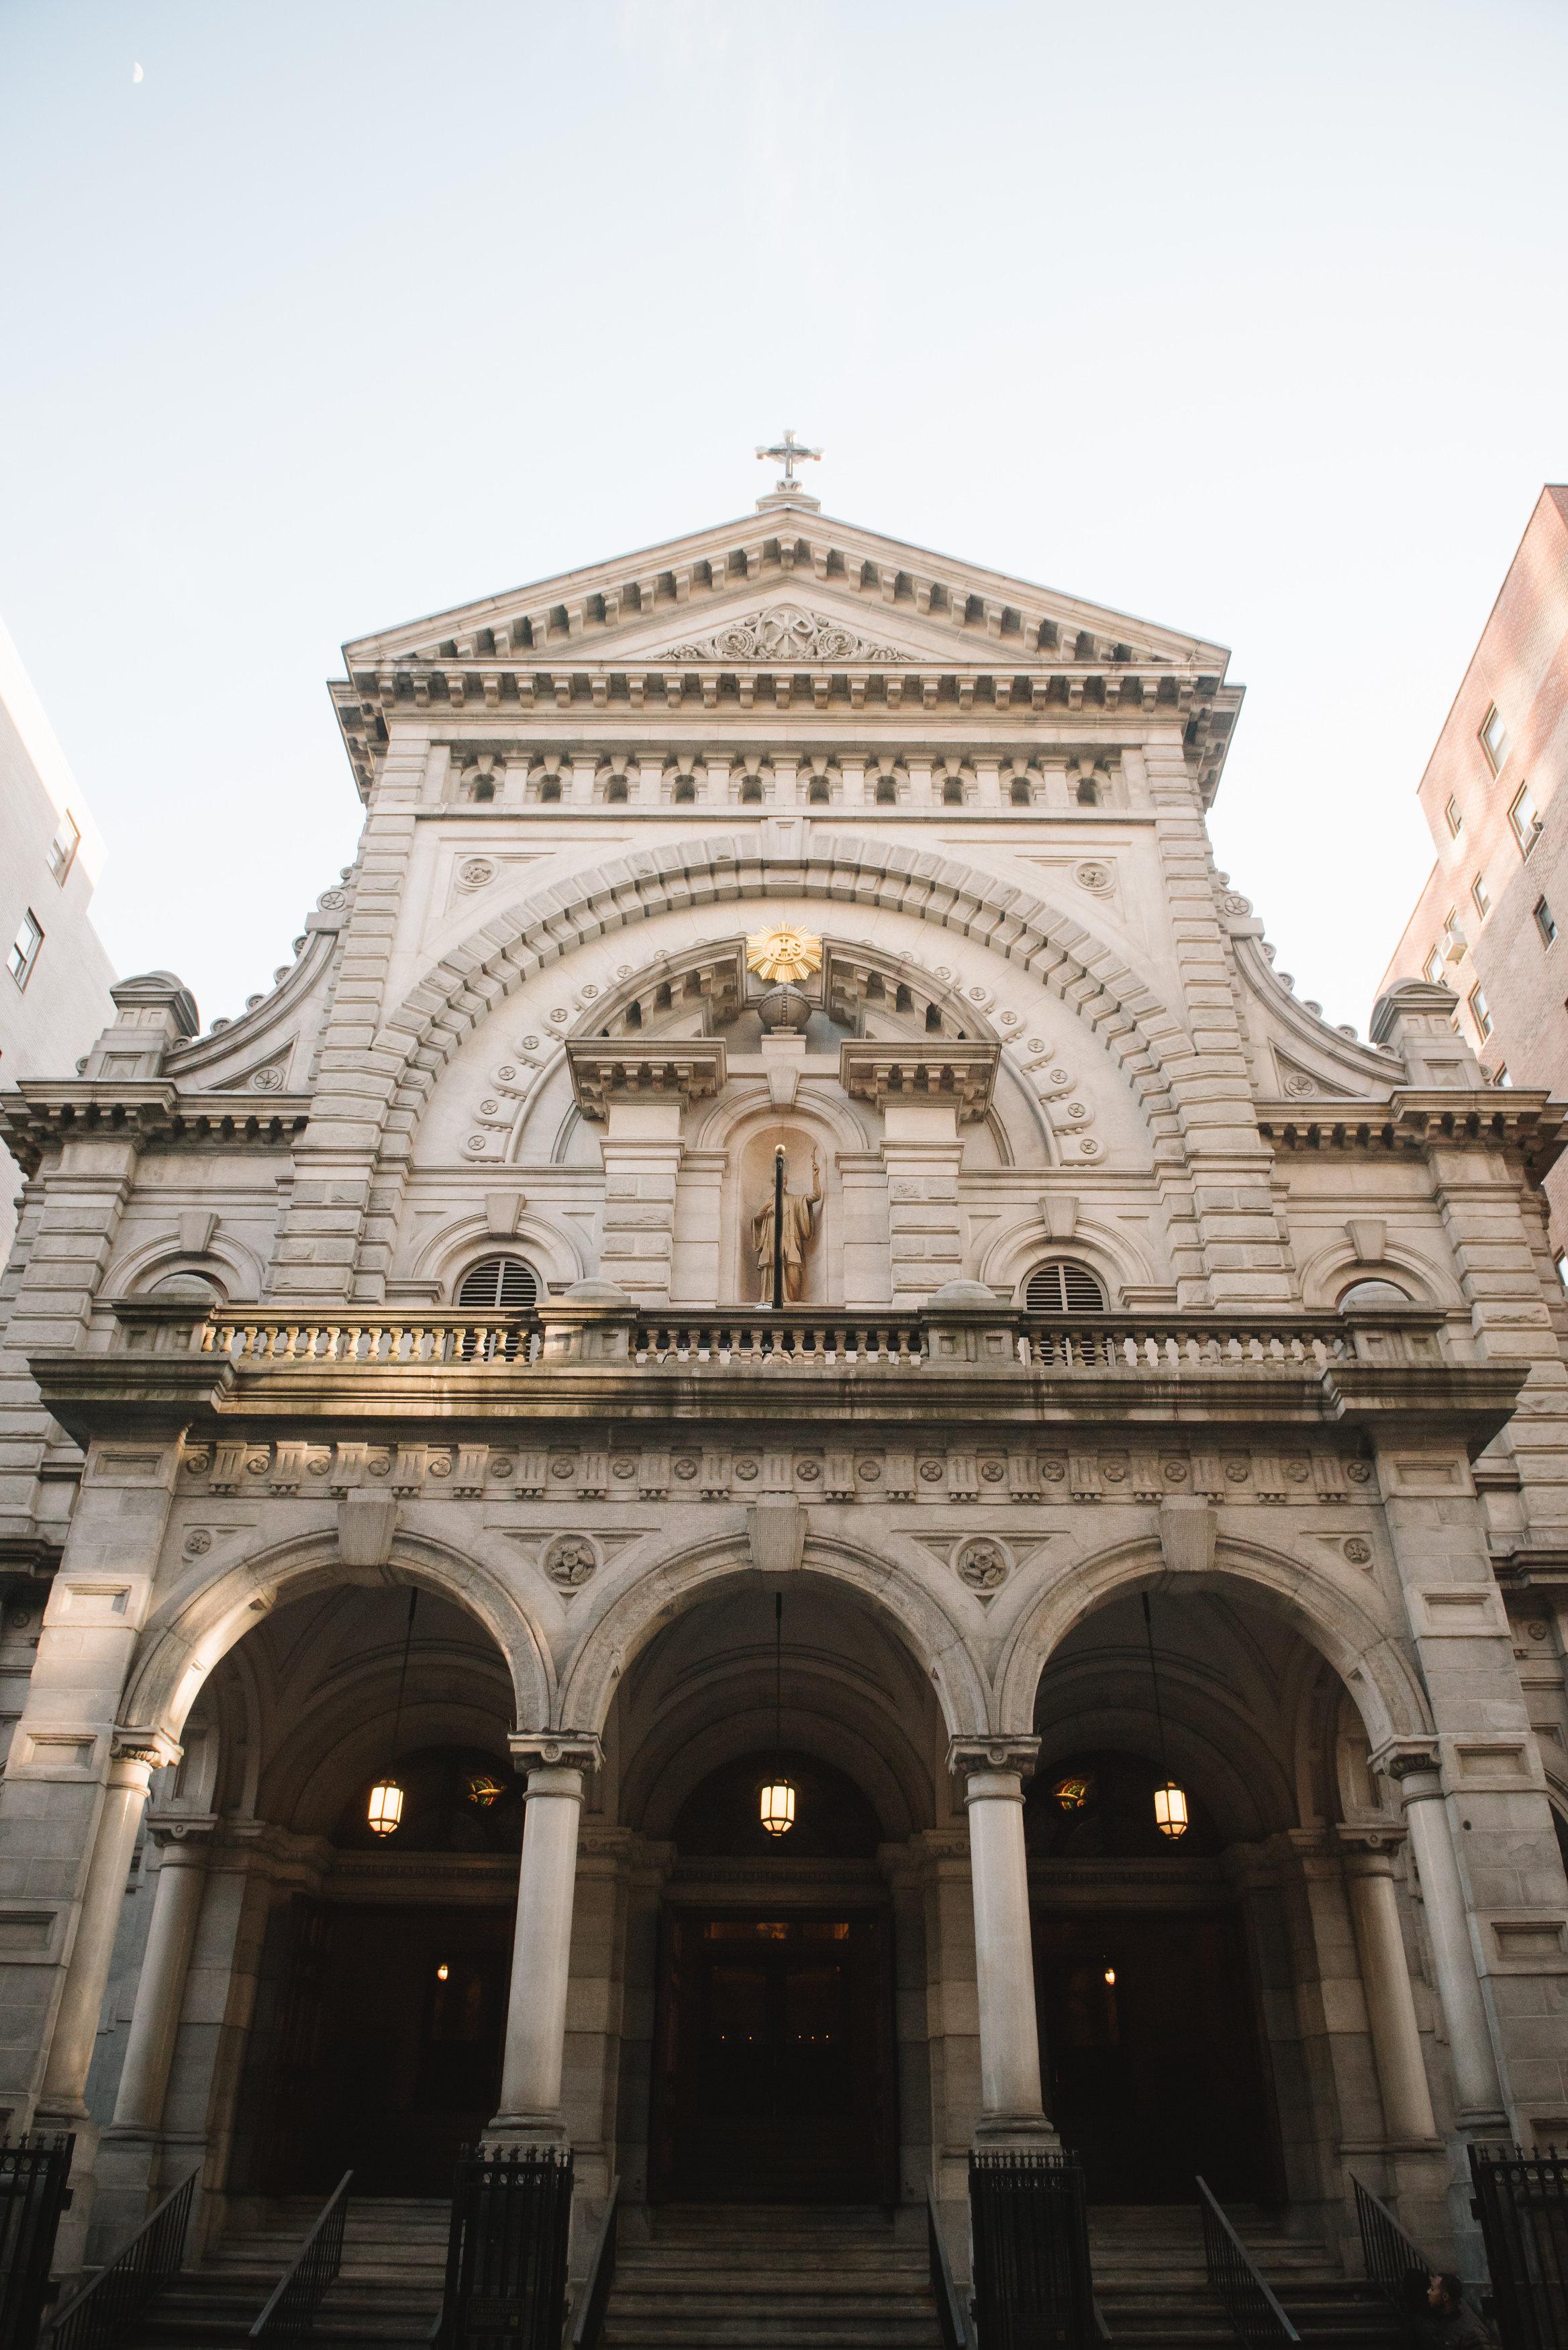 THE CHURCH OF ST FRANCIS XAVIER